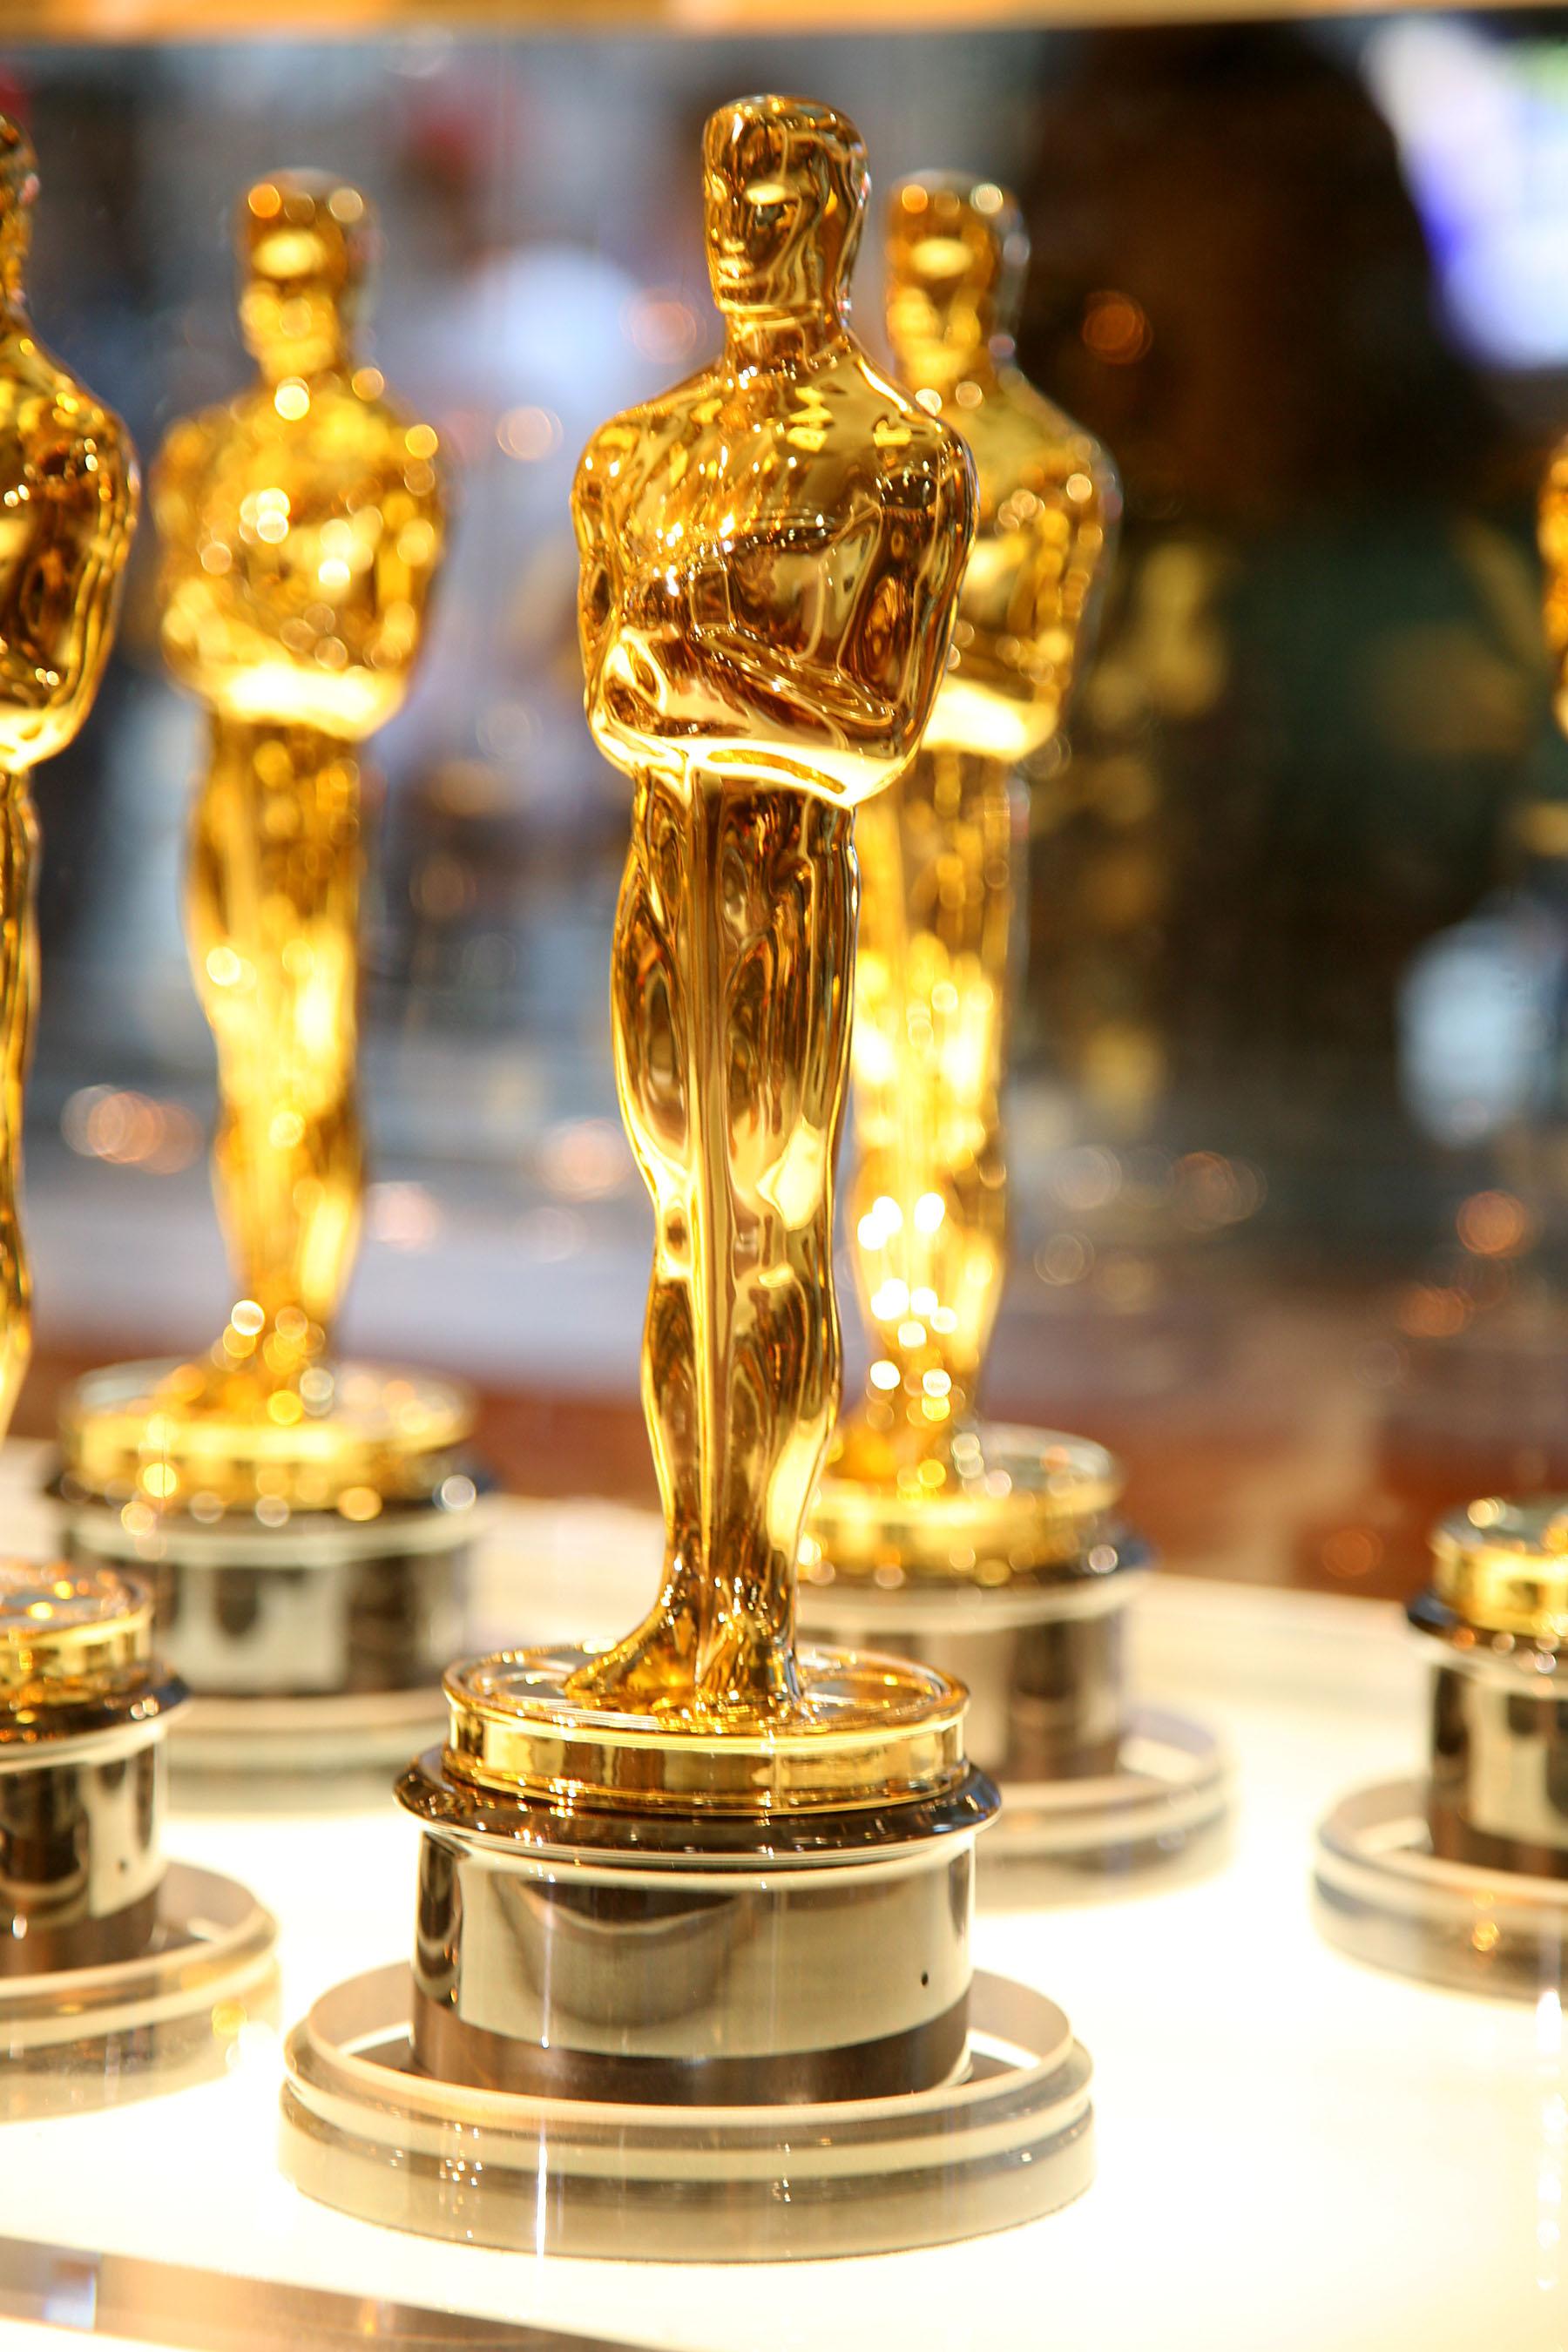 Музыка Эннио Морриконе номинирована на Оскар